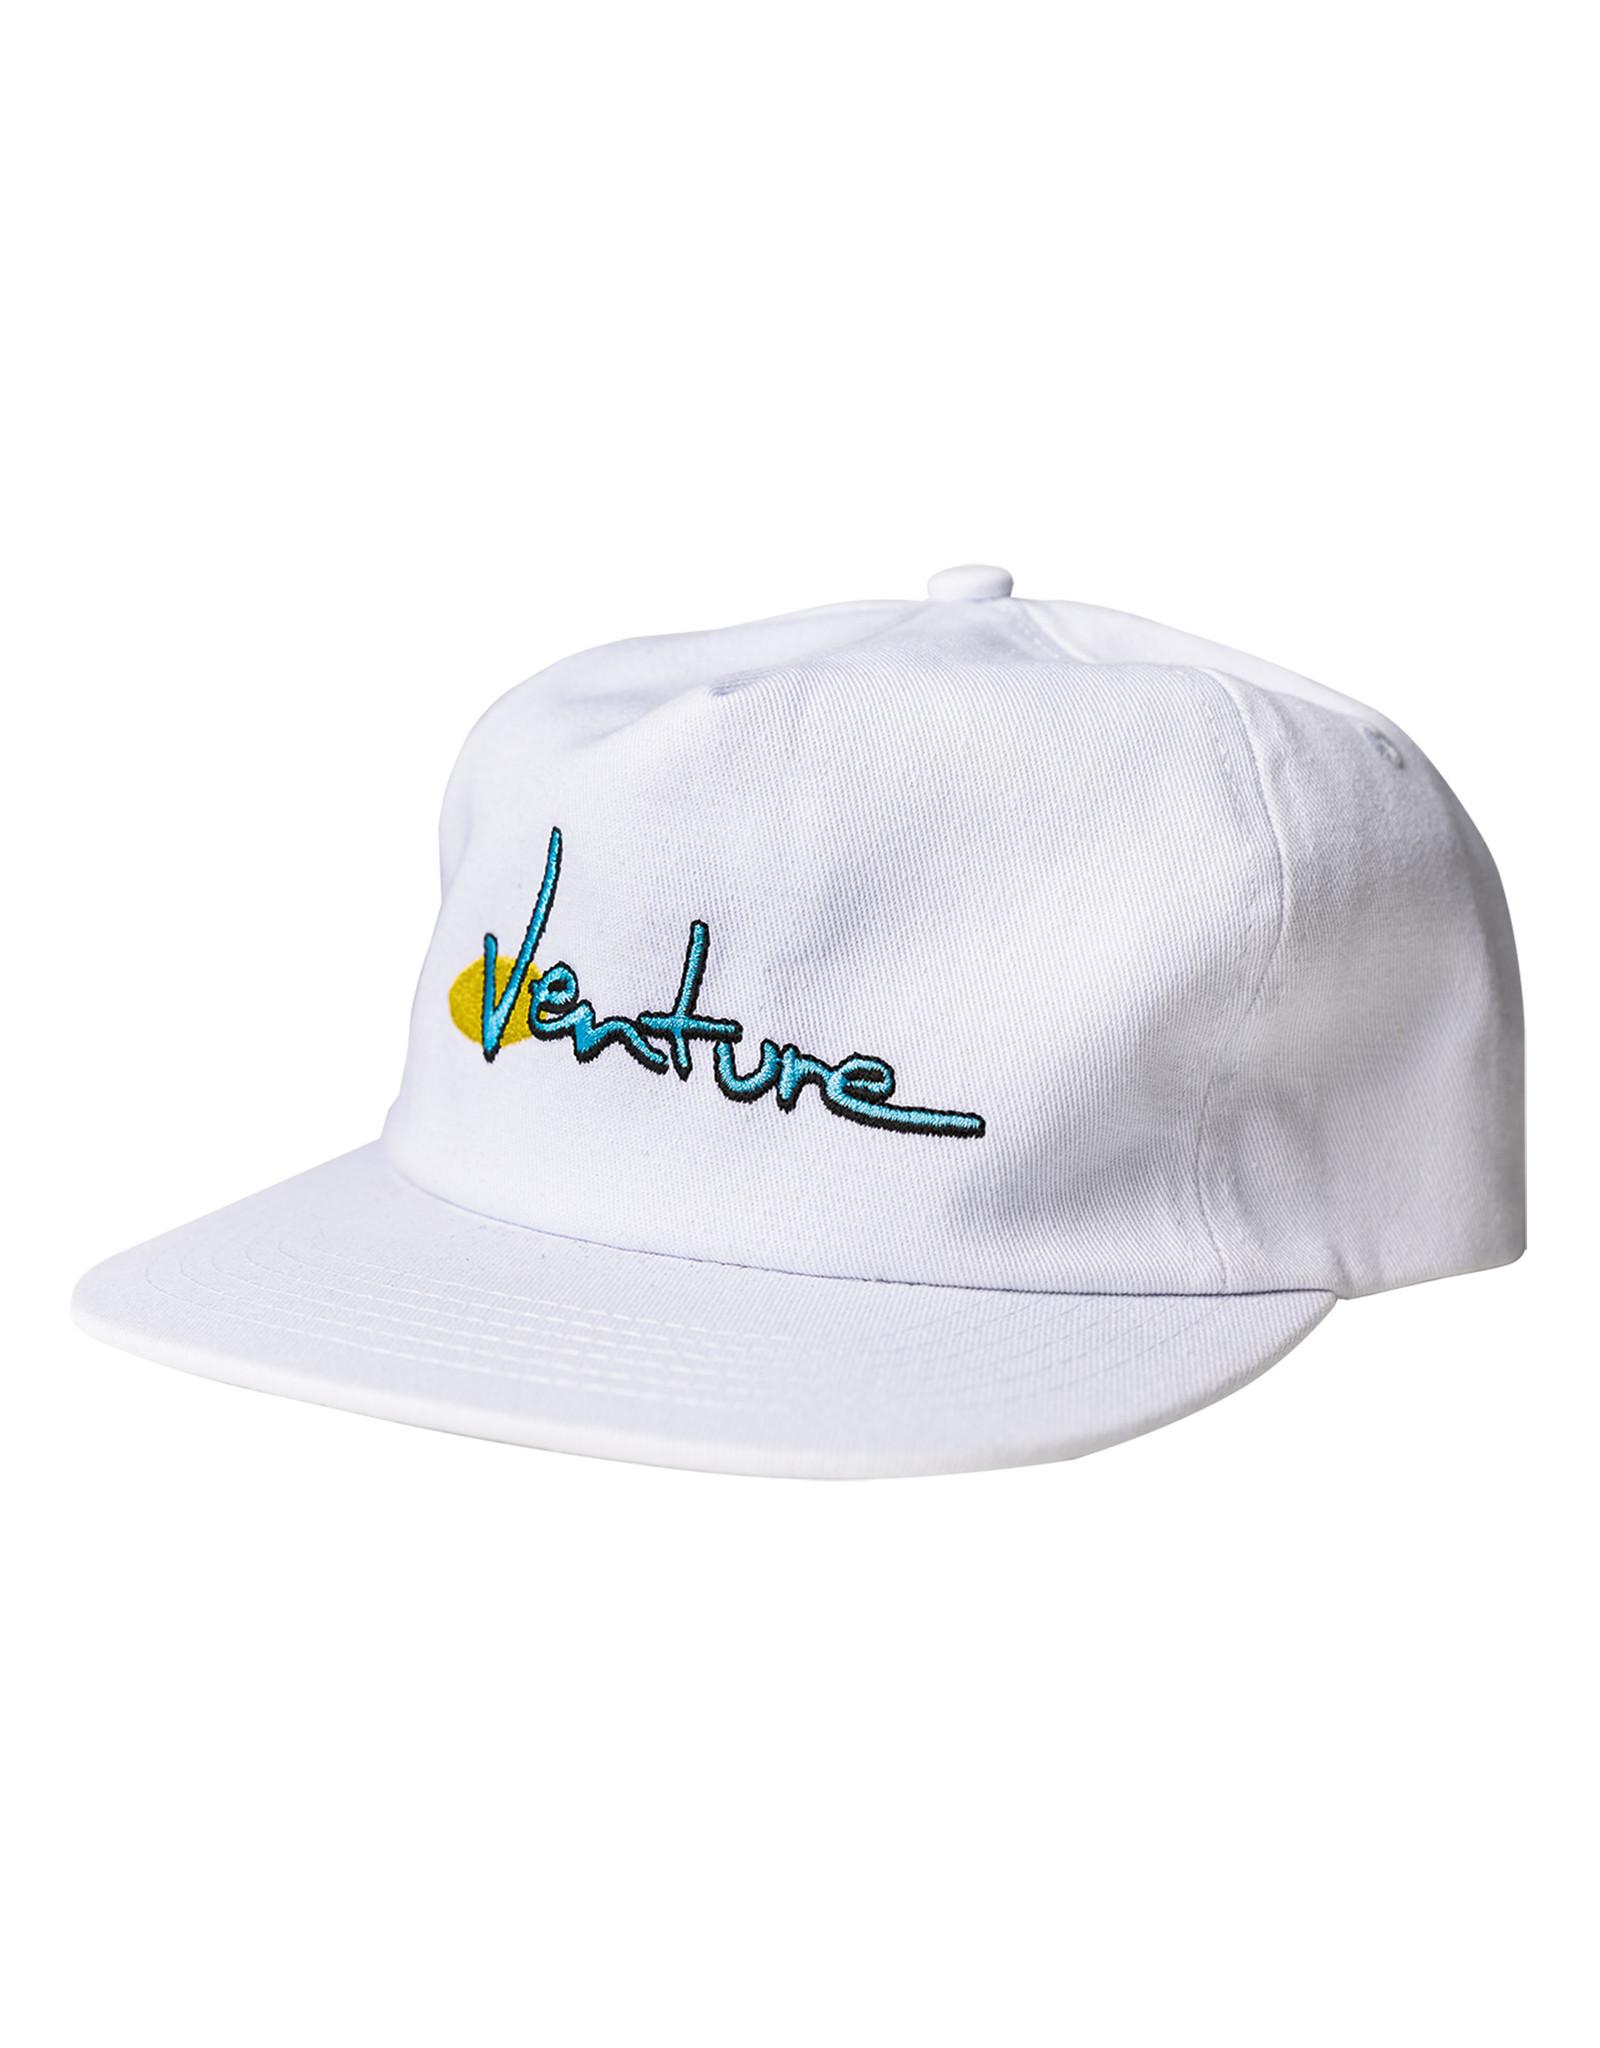 VENTURE VENTURE - 90'S SNAPBACK - WHITE